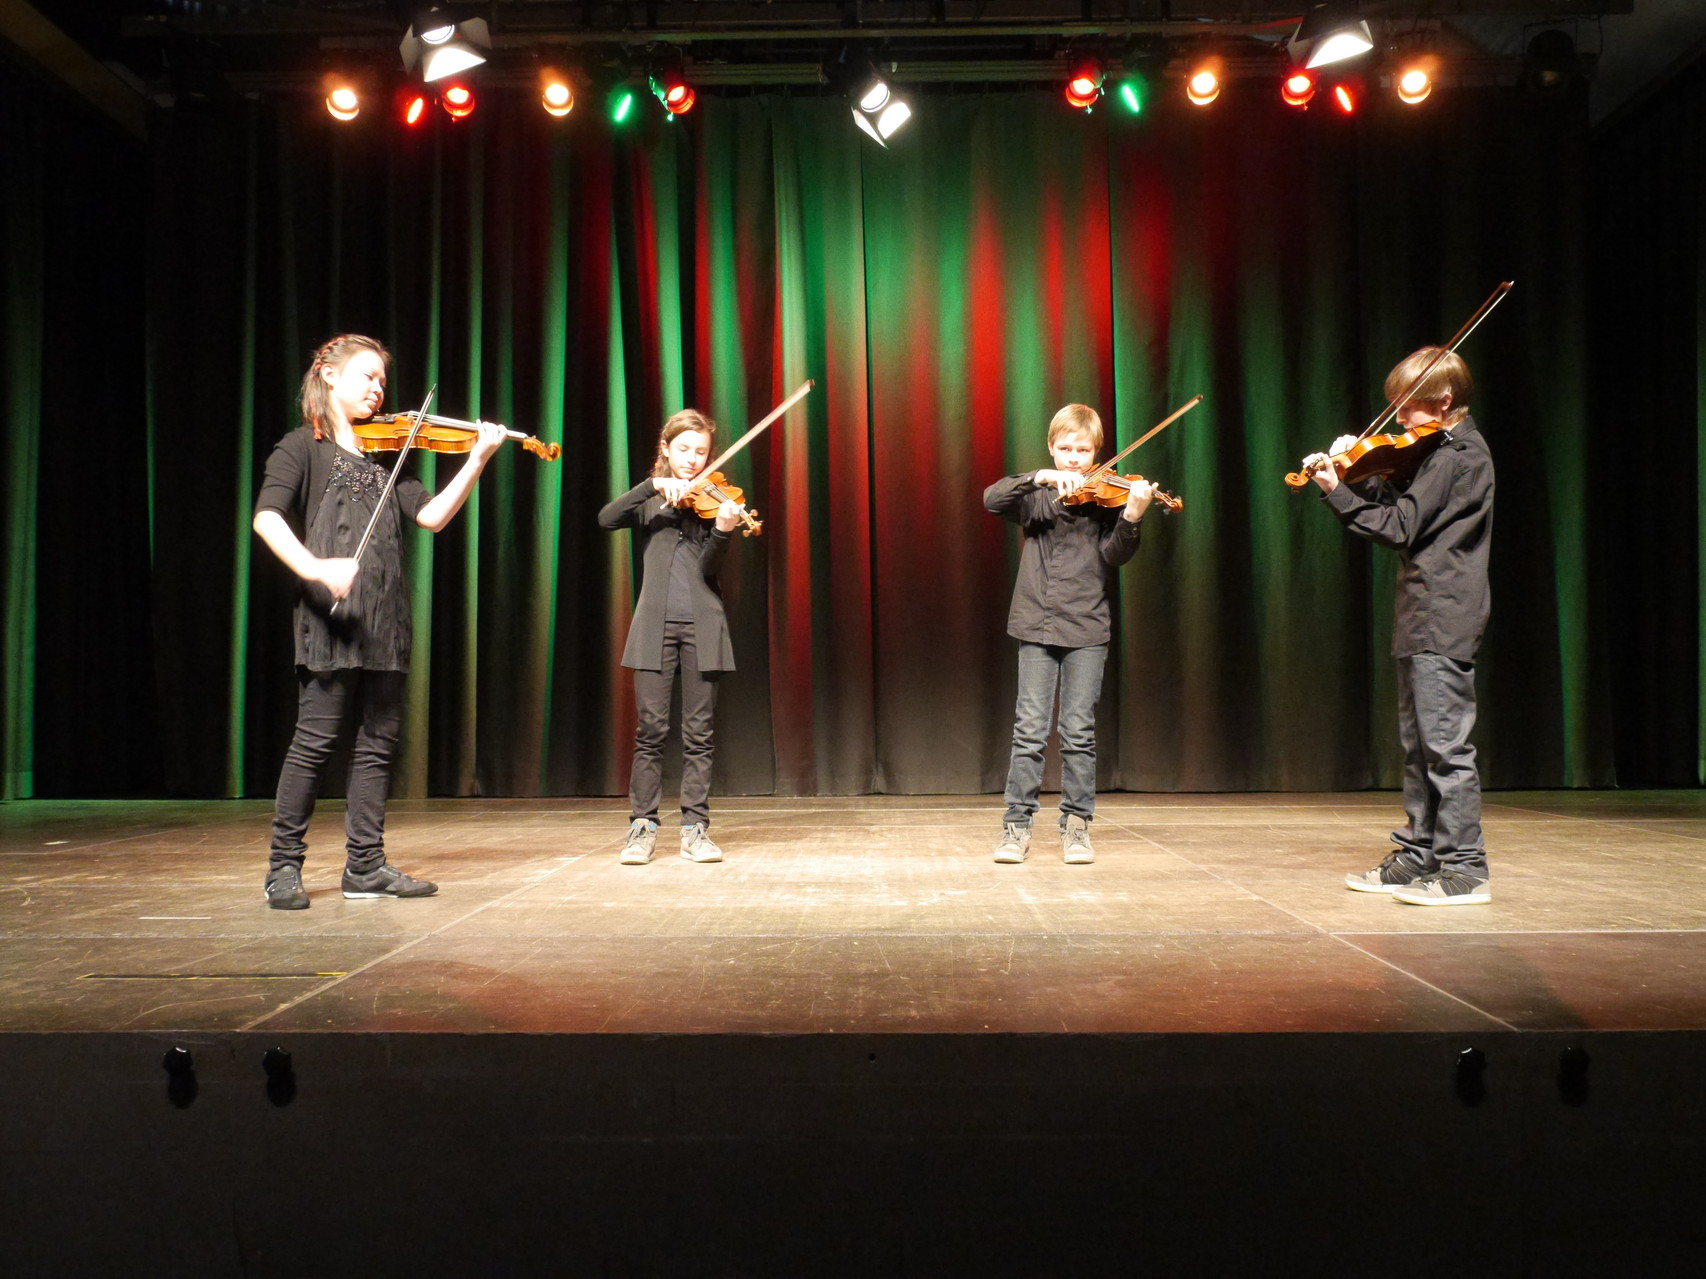 Hamapaati-Quartett